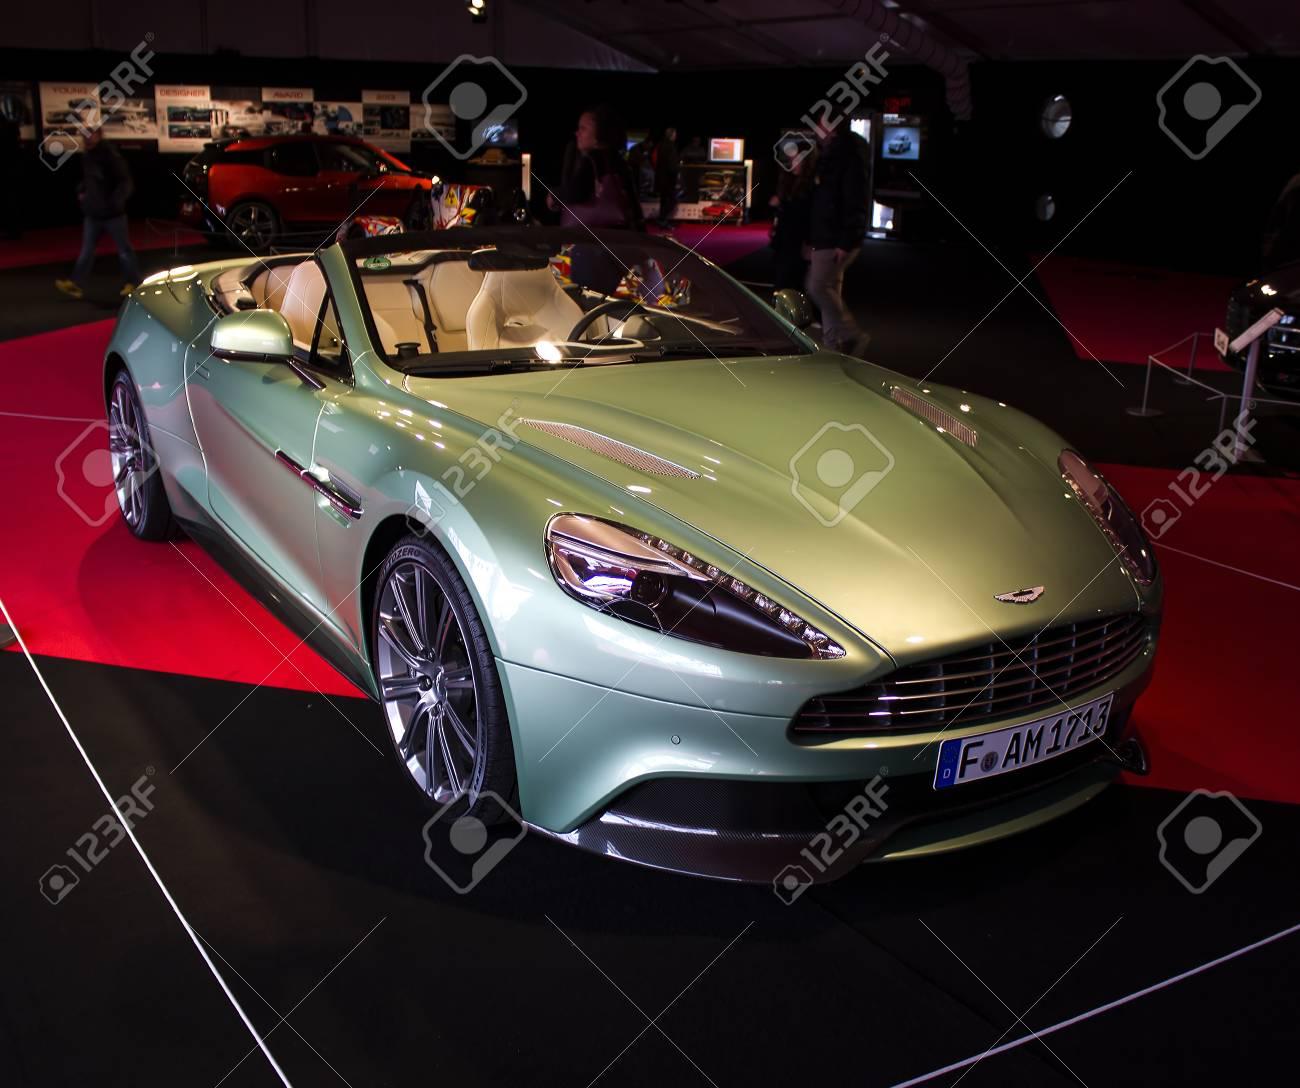 Paris January 30 Aston Martin Front View Concept Cars